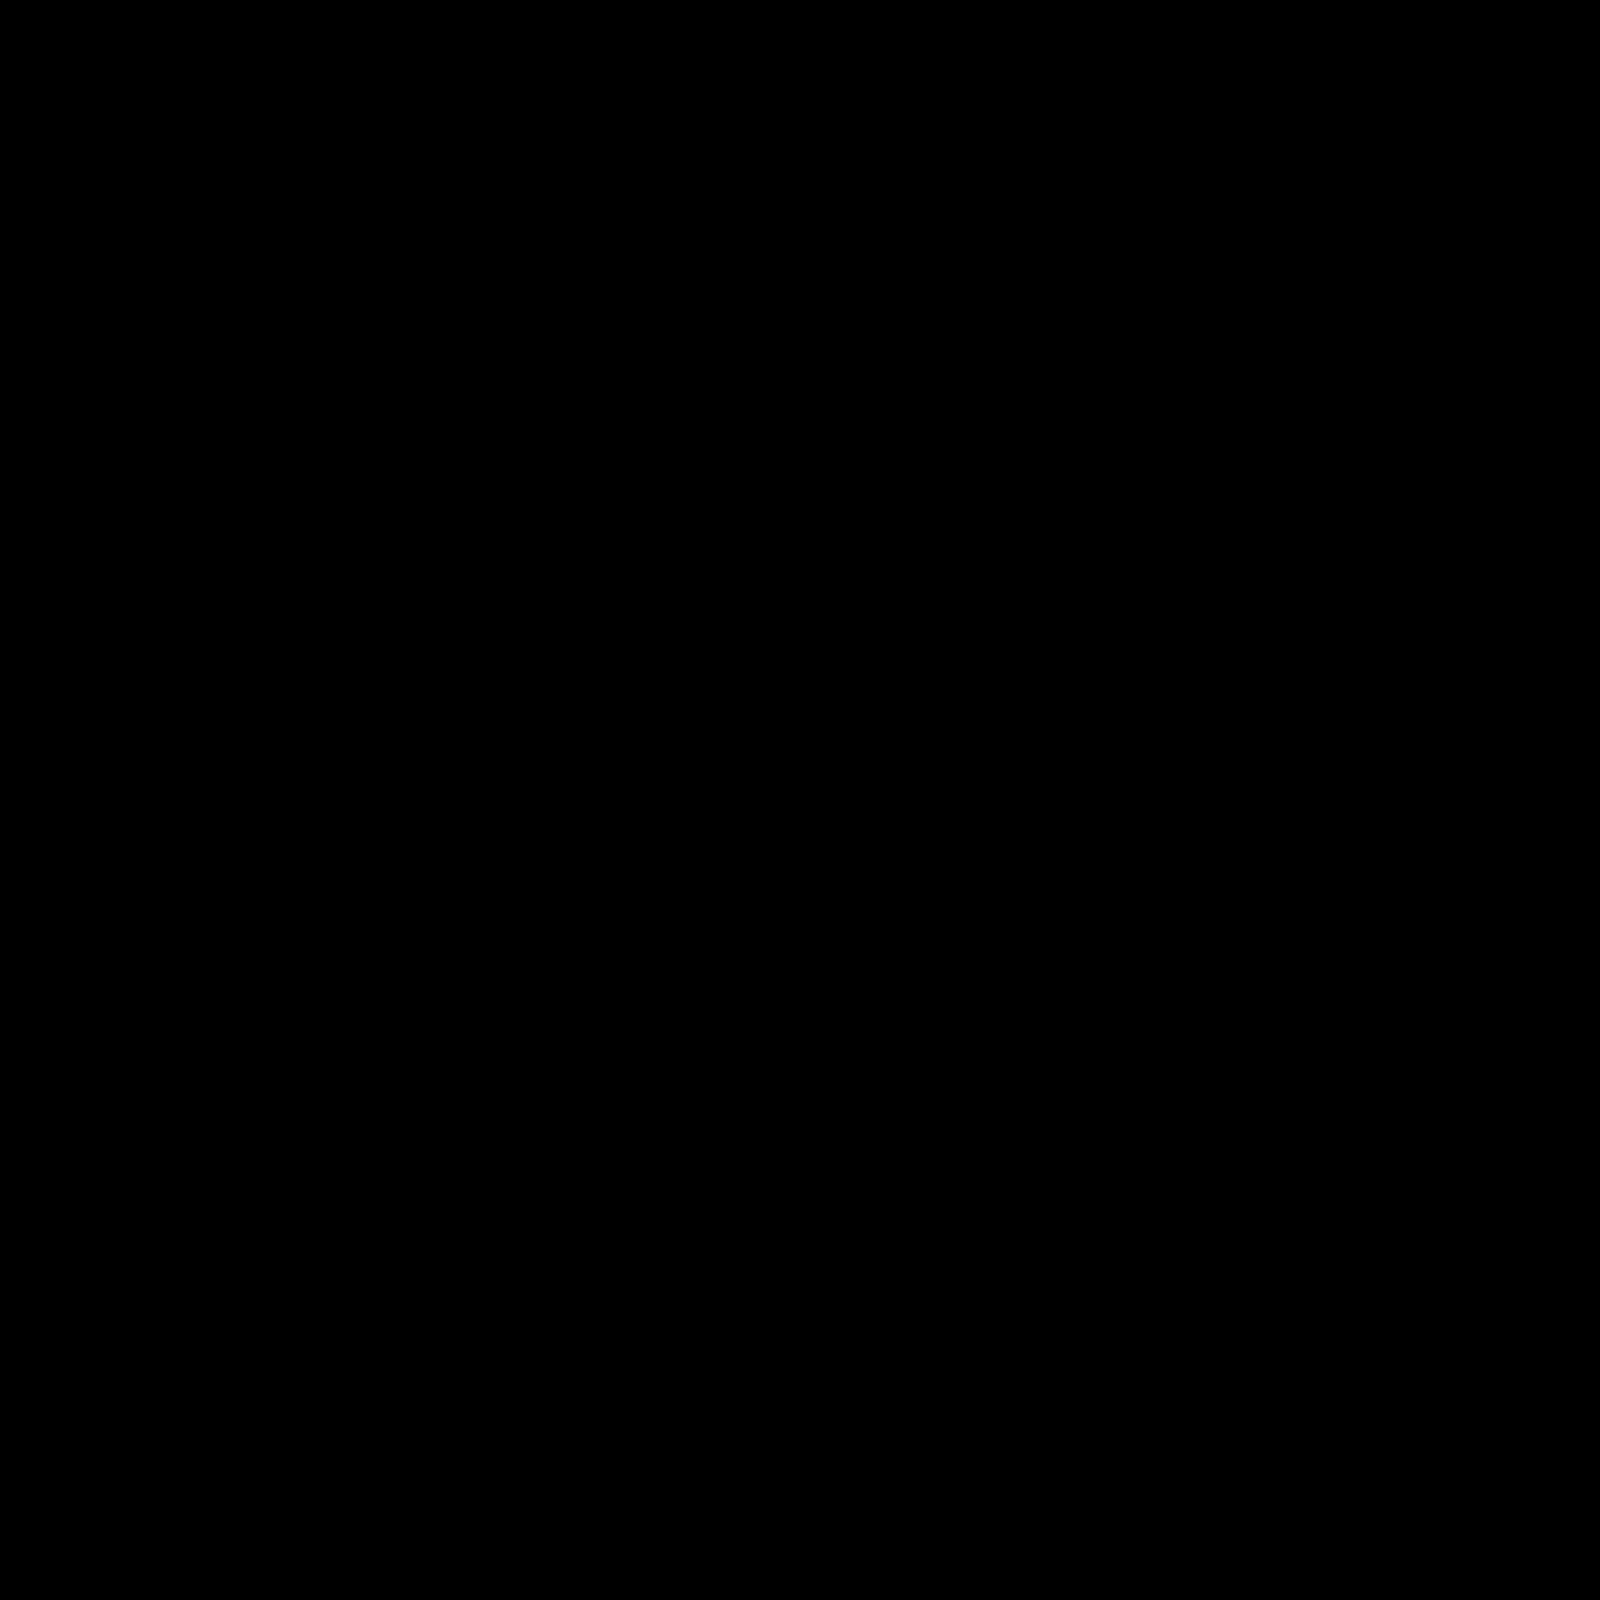 Diploma clipart certificate symbol. Cert iv in tesol